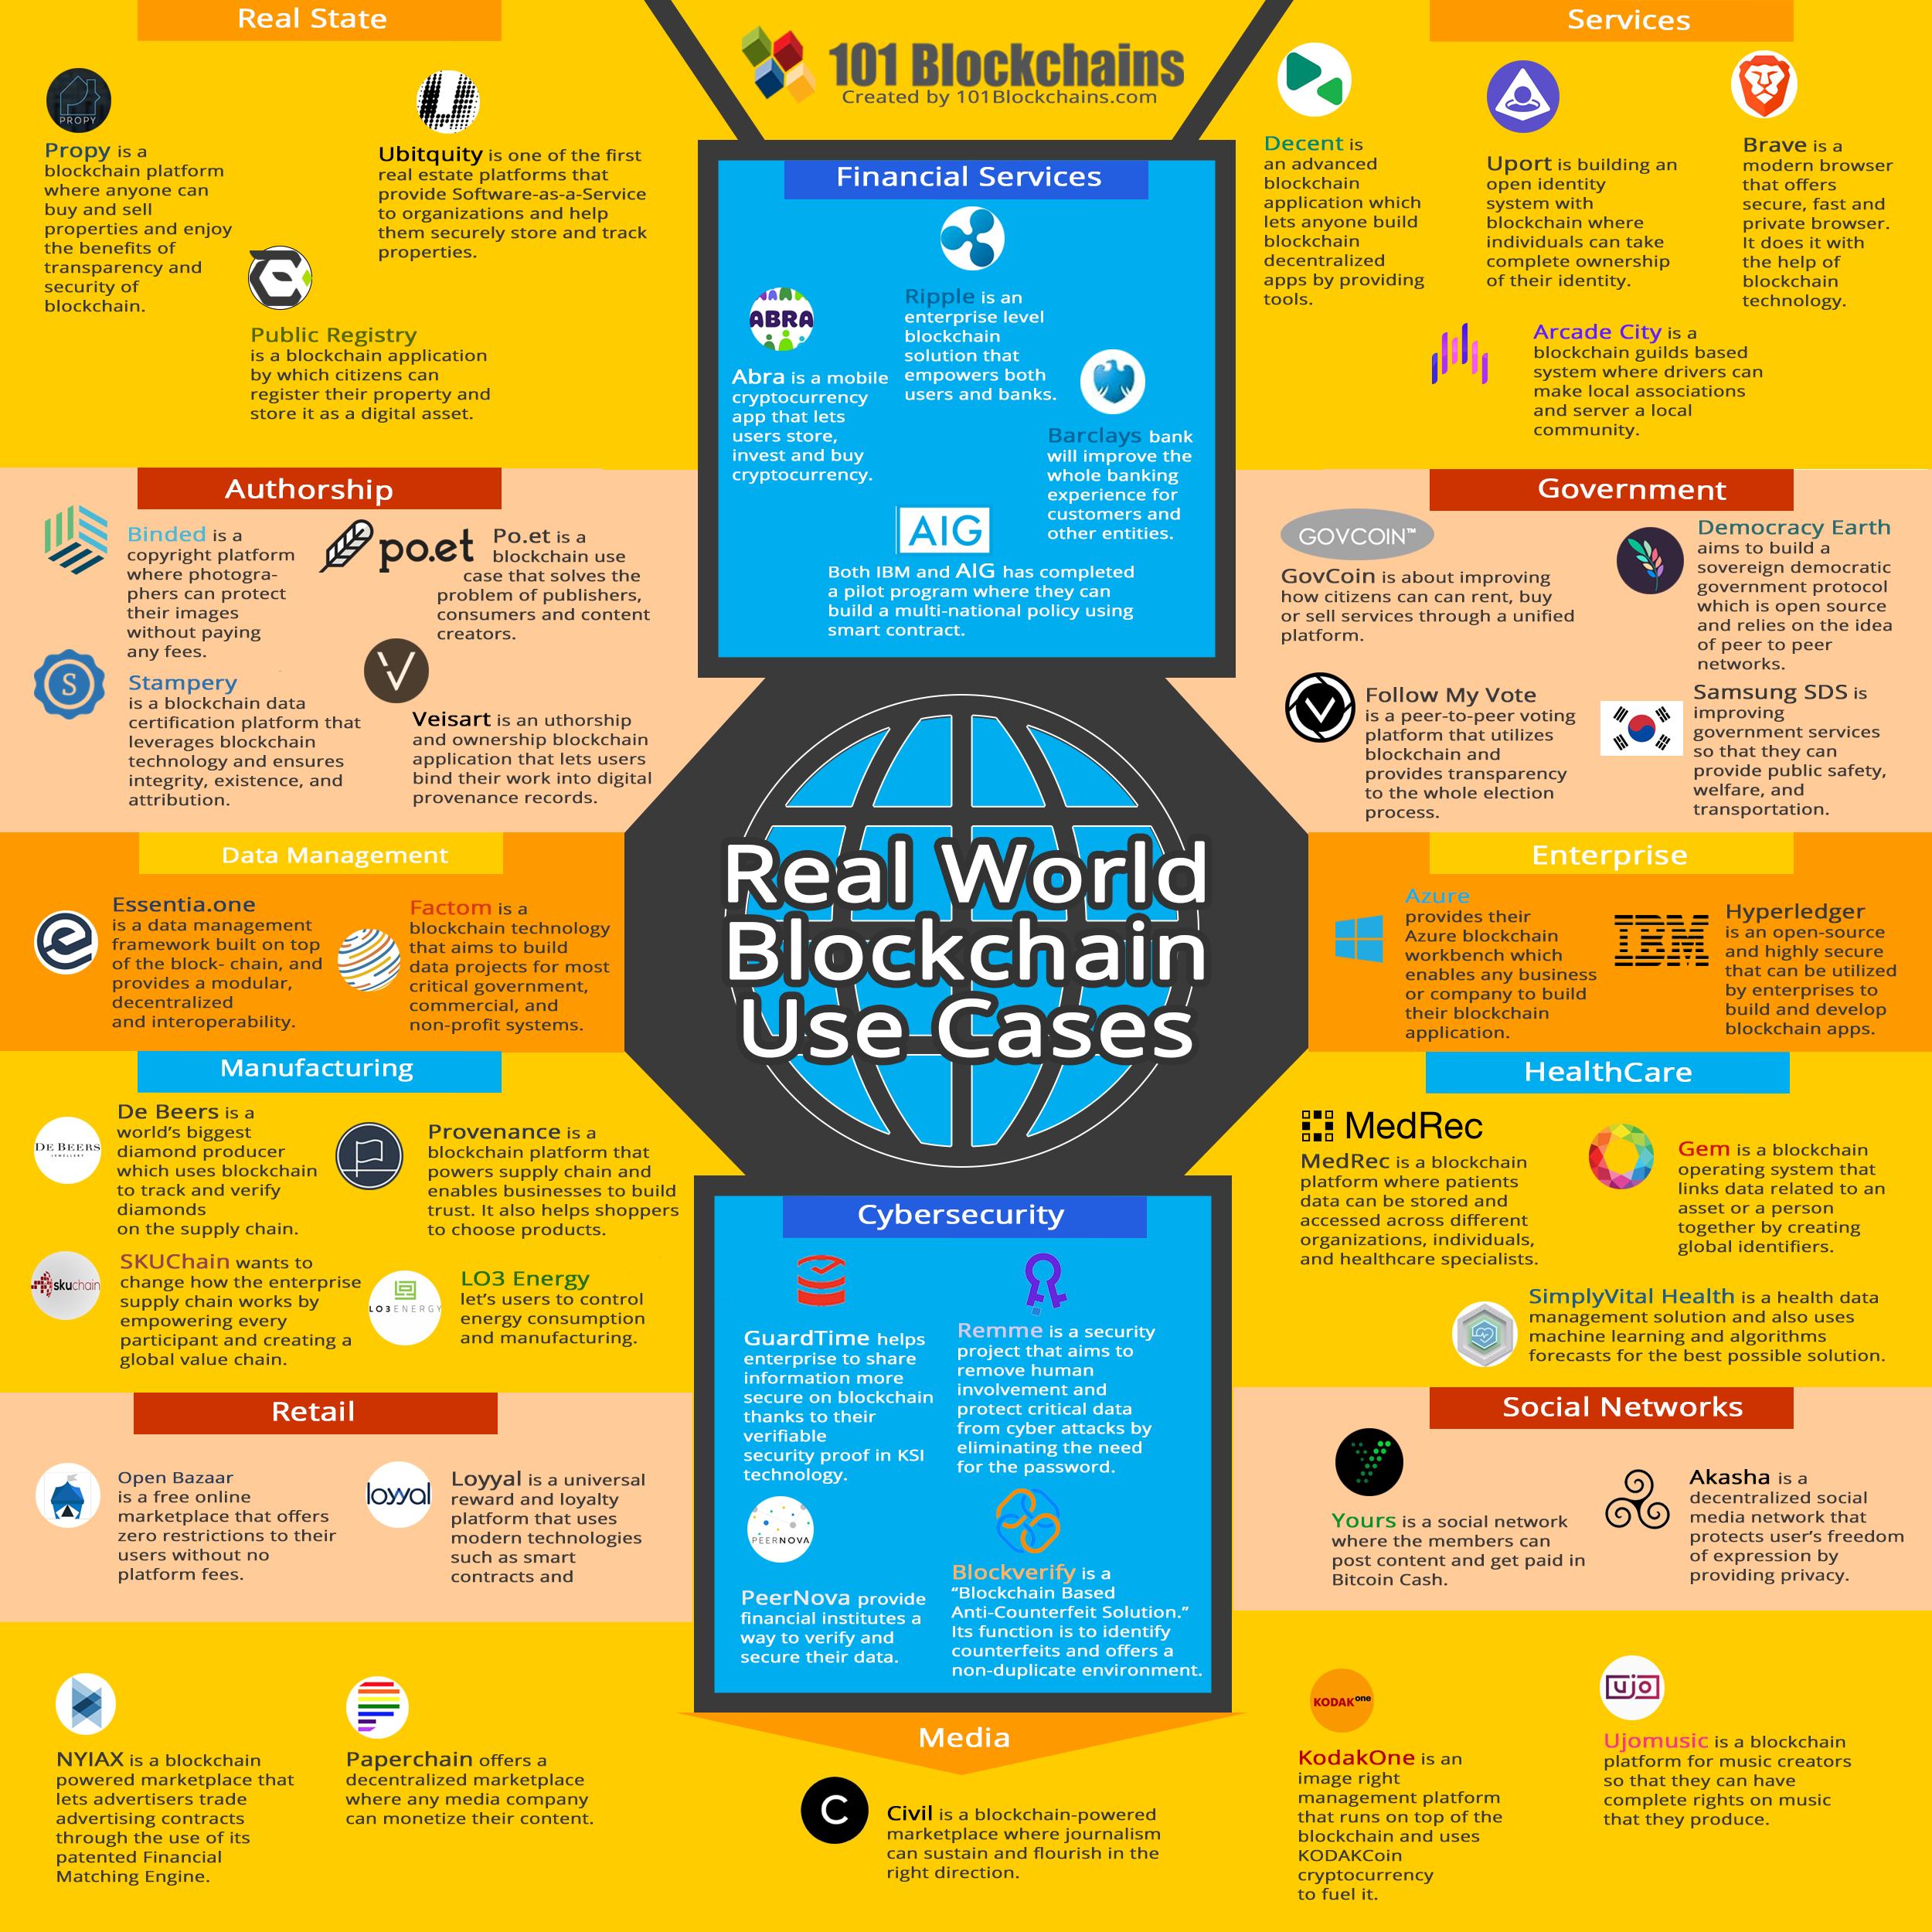 45 Real World Blockchain Use Cases Blockchain Applications Infographic Blockchaintechnology Smartcontracts Bloc Blockchain Use Case Blockchain Technology